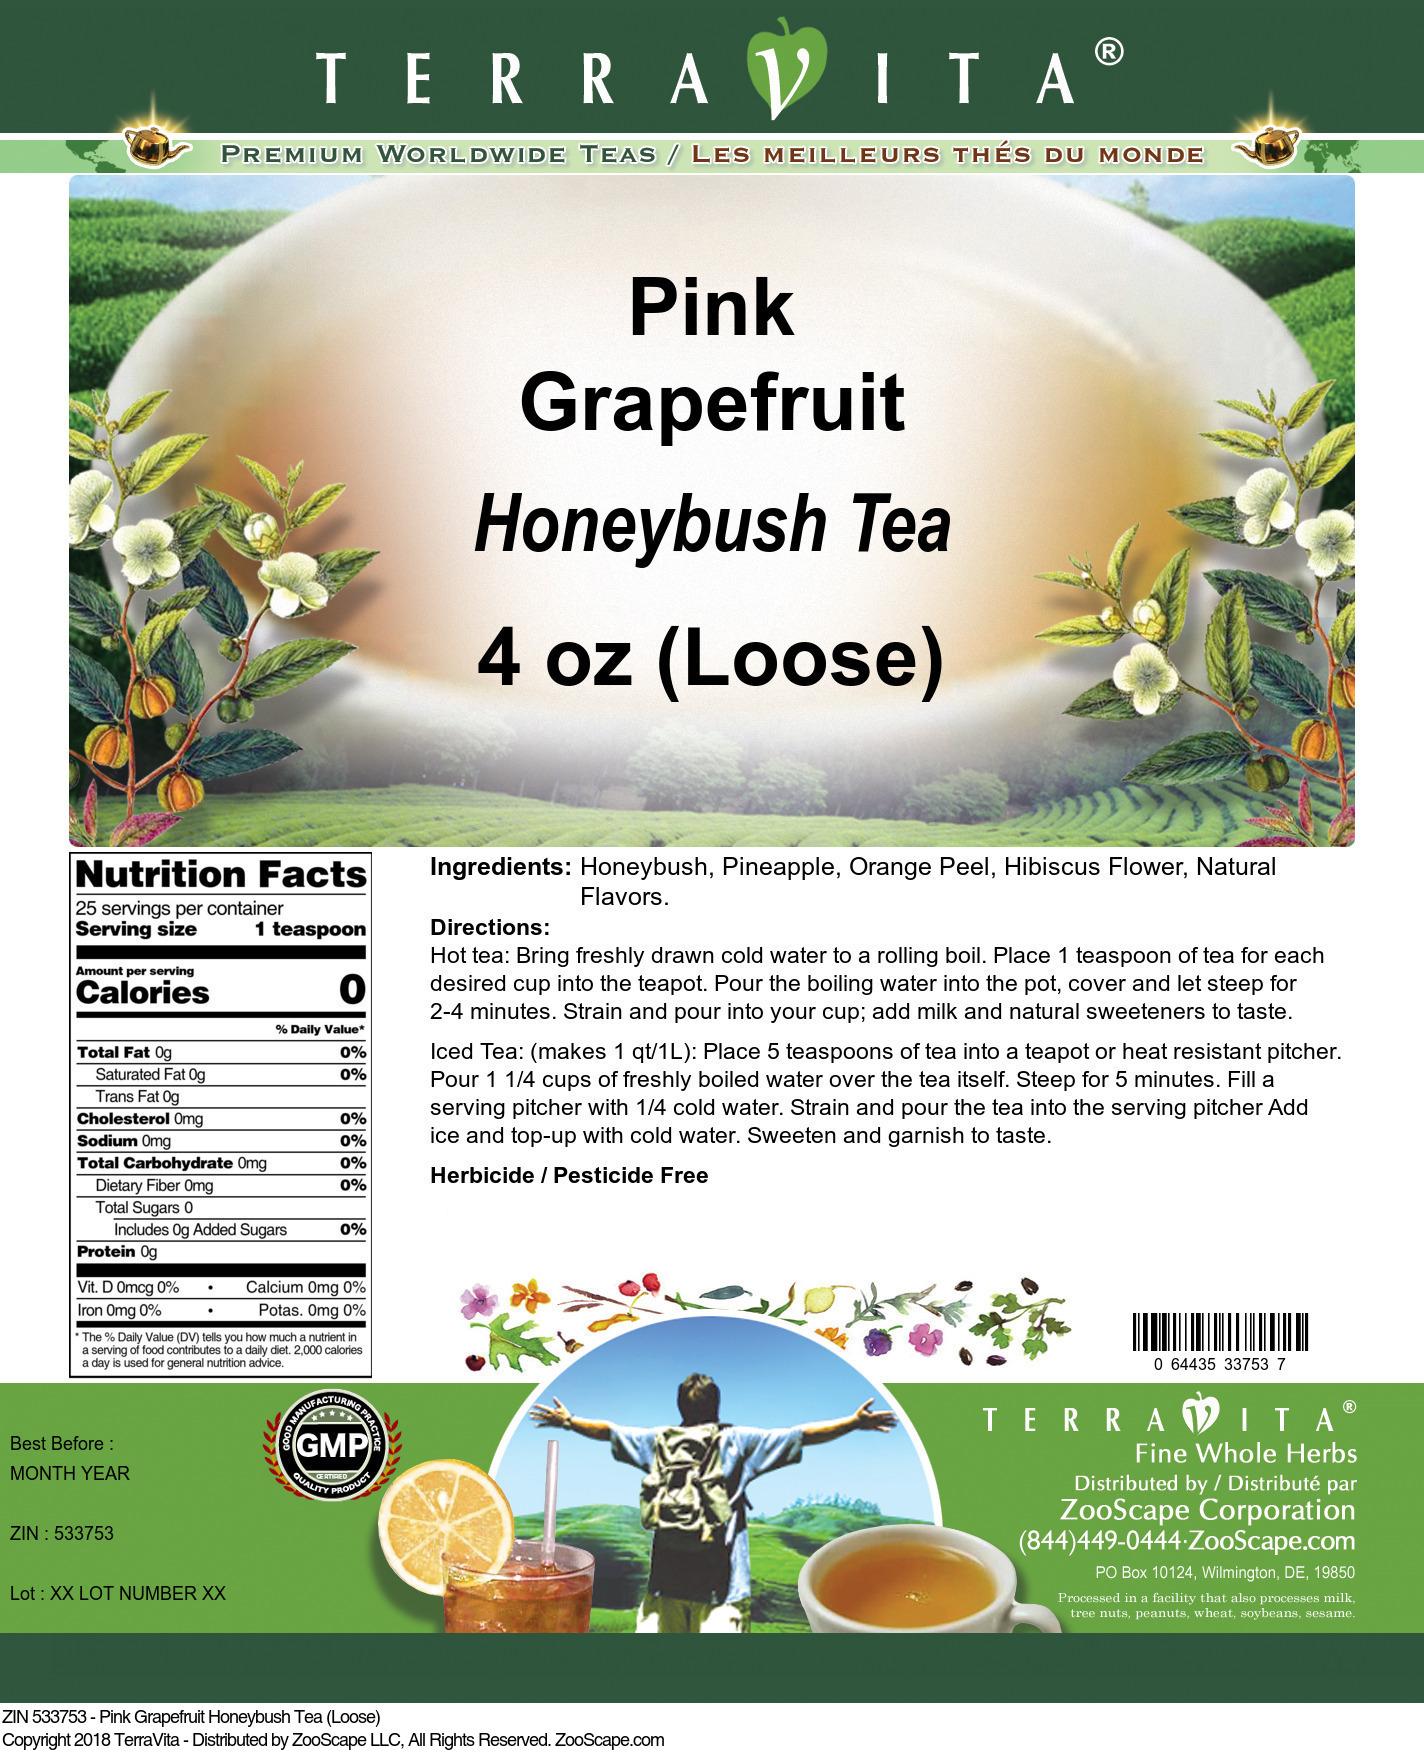 Pink Grapefruit Honeybush Tea